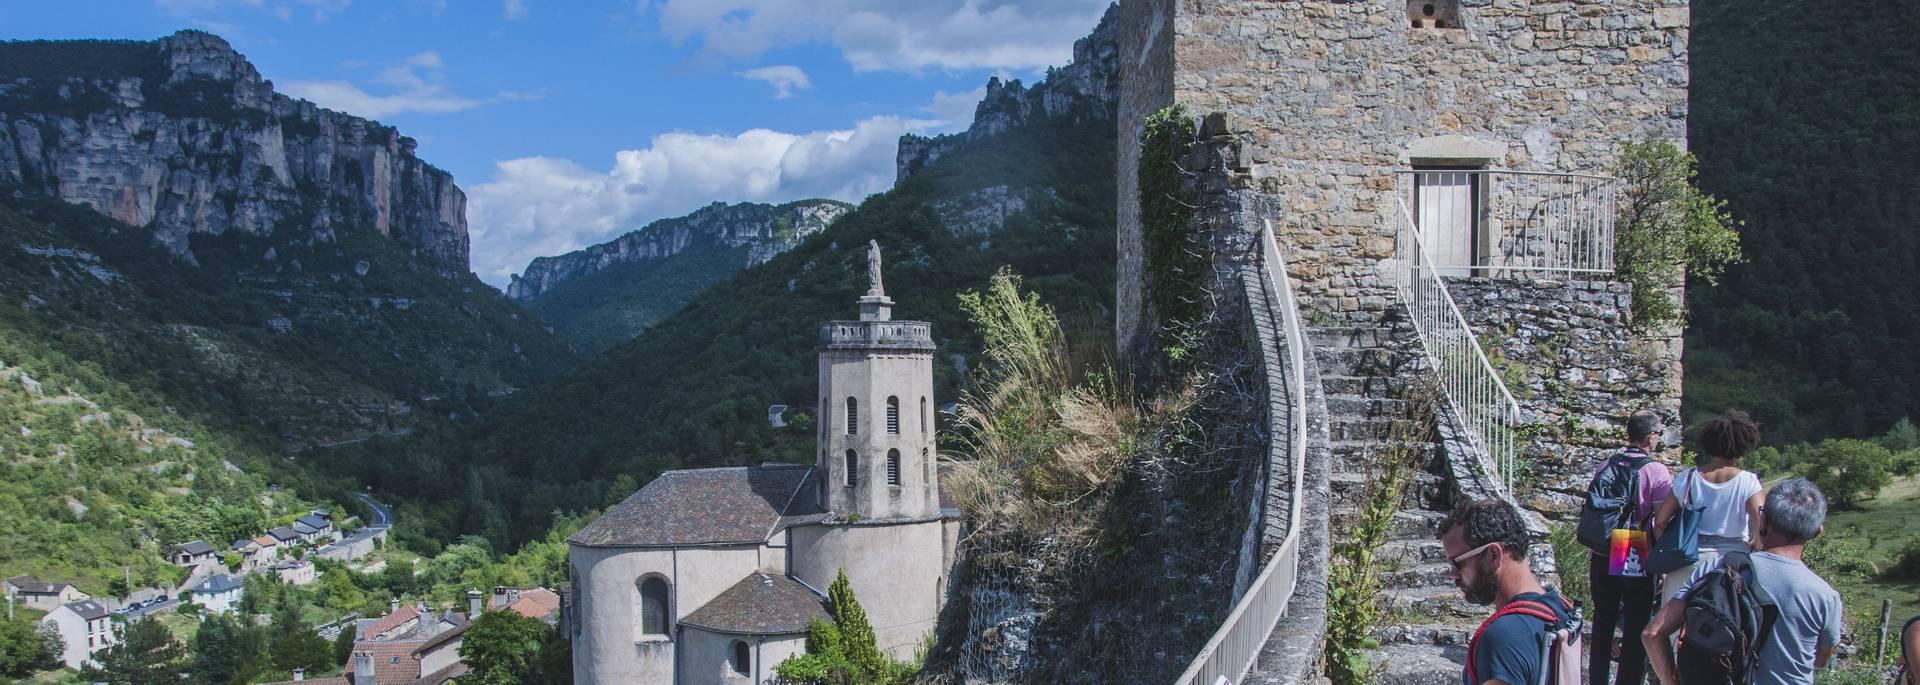 Tour Carrée de Peyreleau